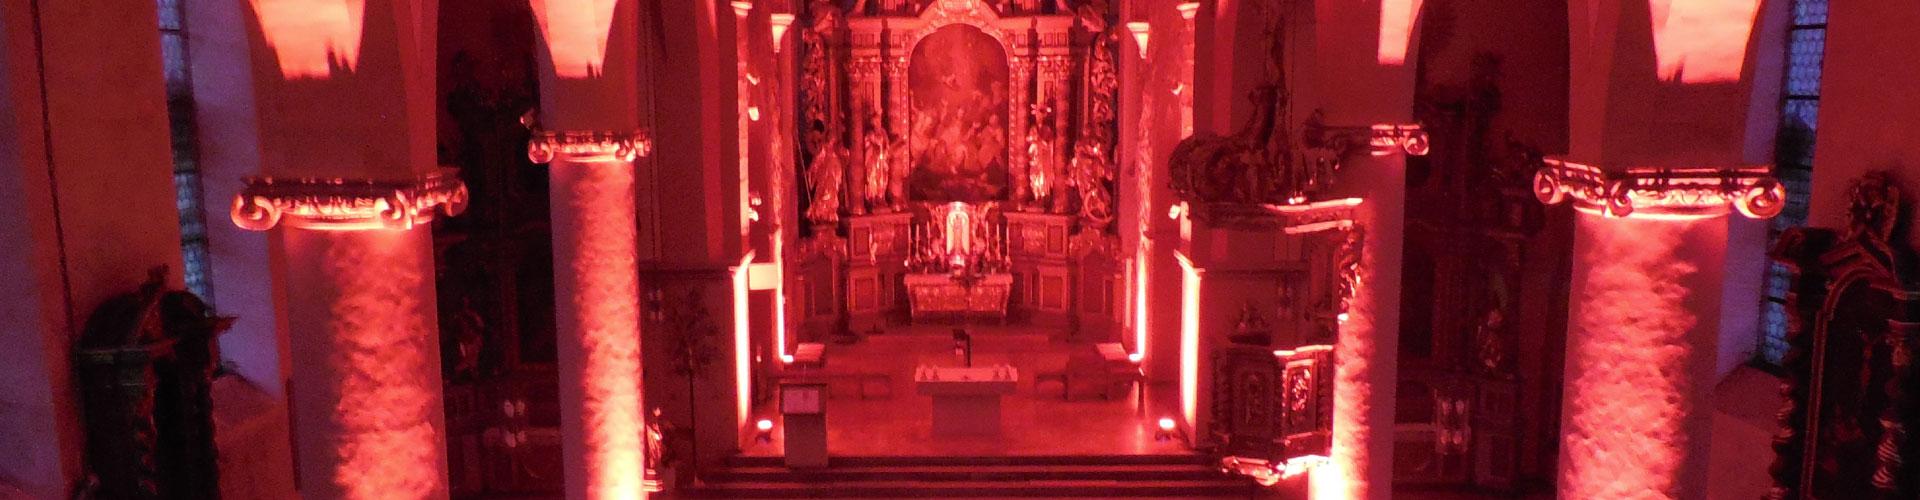 Pfarrkirche St. Kilian